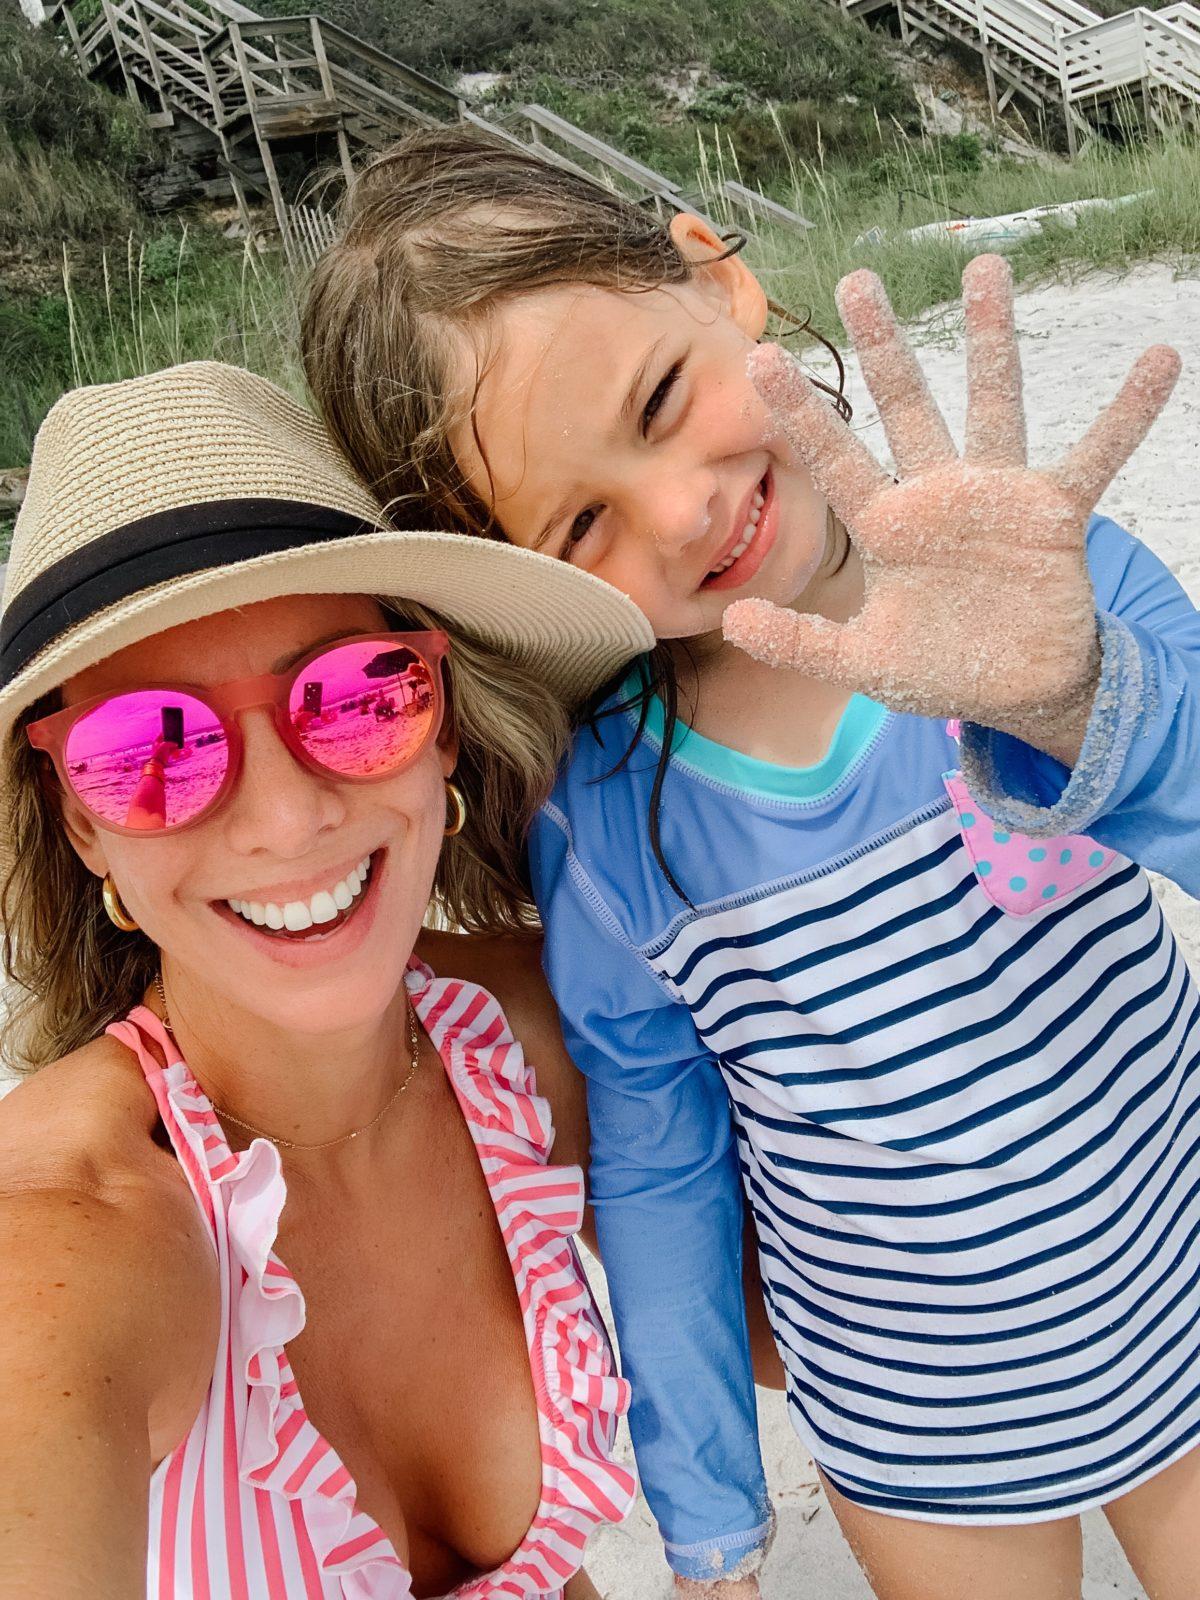 Goodr Sunglasses, Striped Swimsuit, Sun Hat